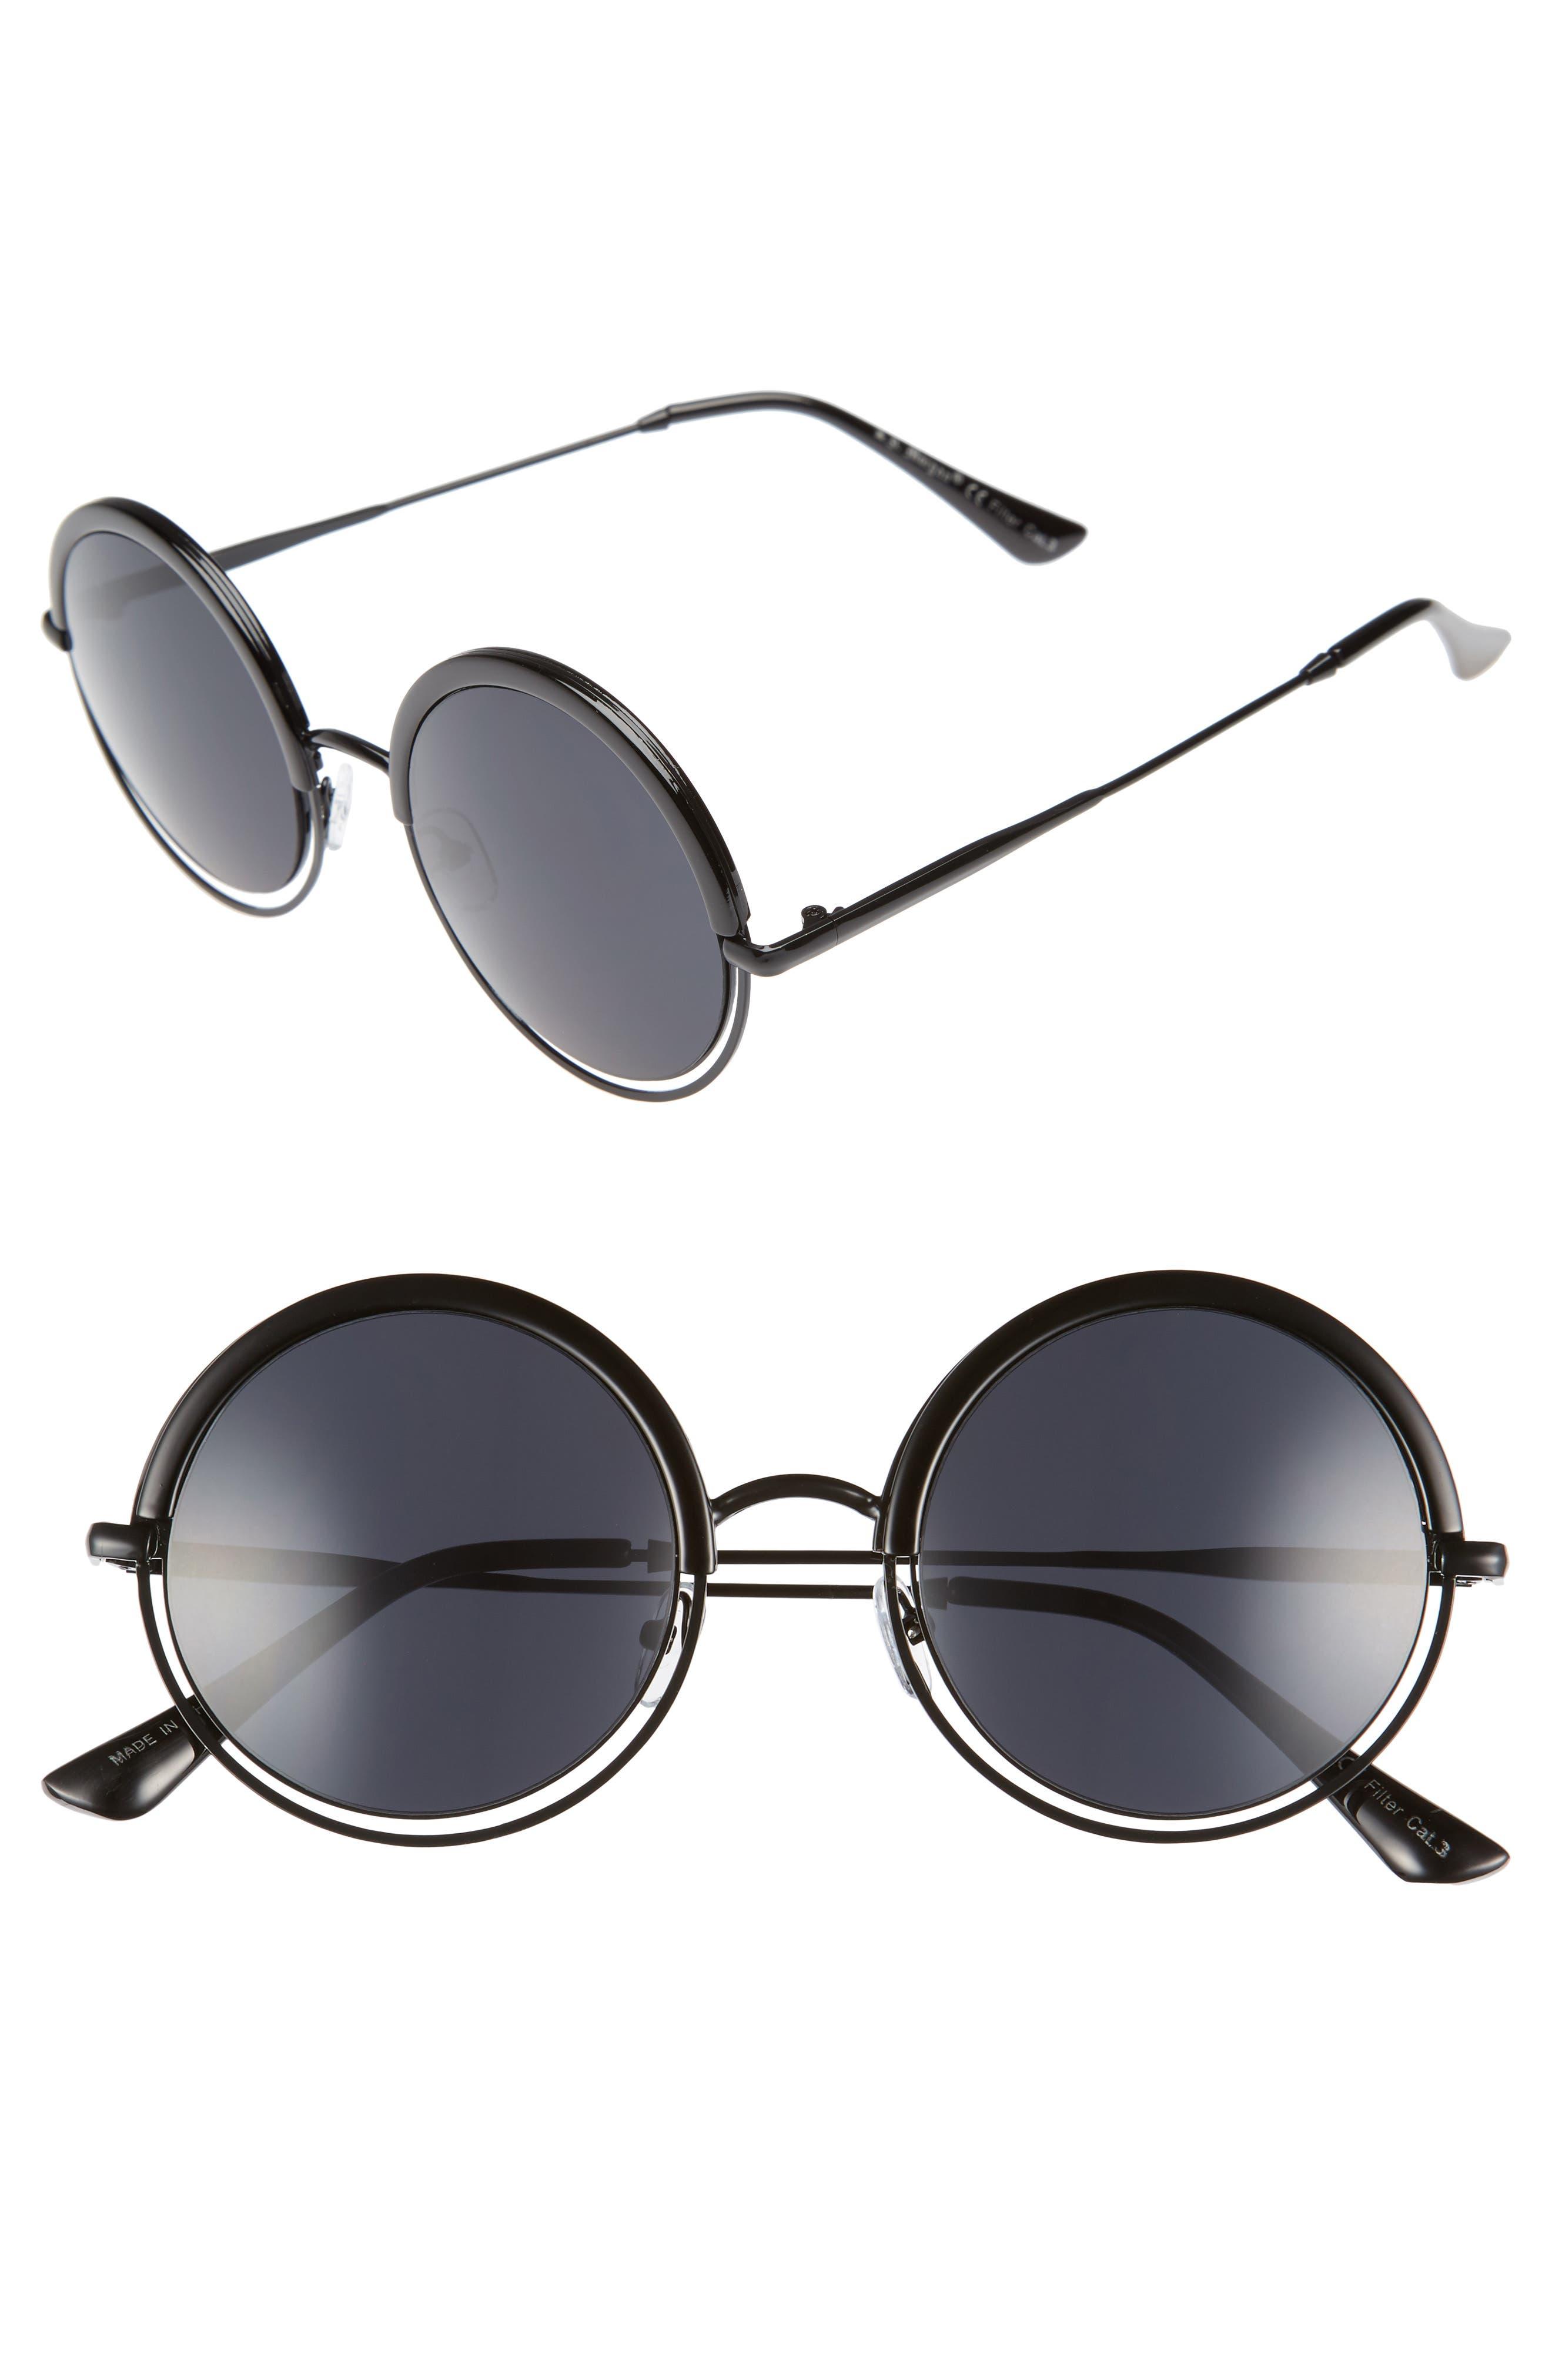 Alternate Image 1 Selected - A.J. Morgan Pancakes 52mm Gradient Lens Round Sunglasses